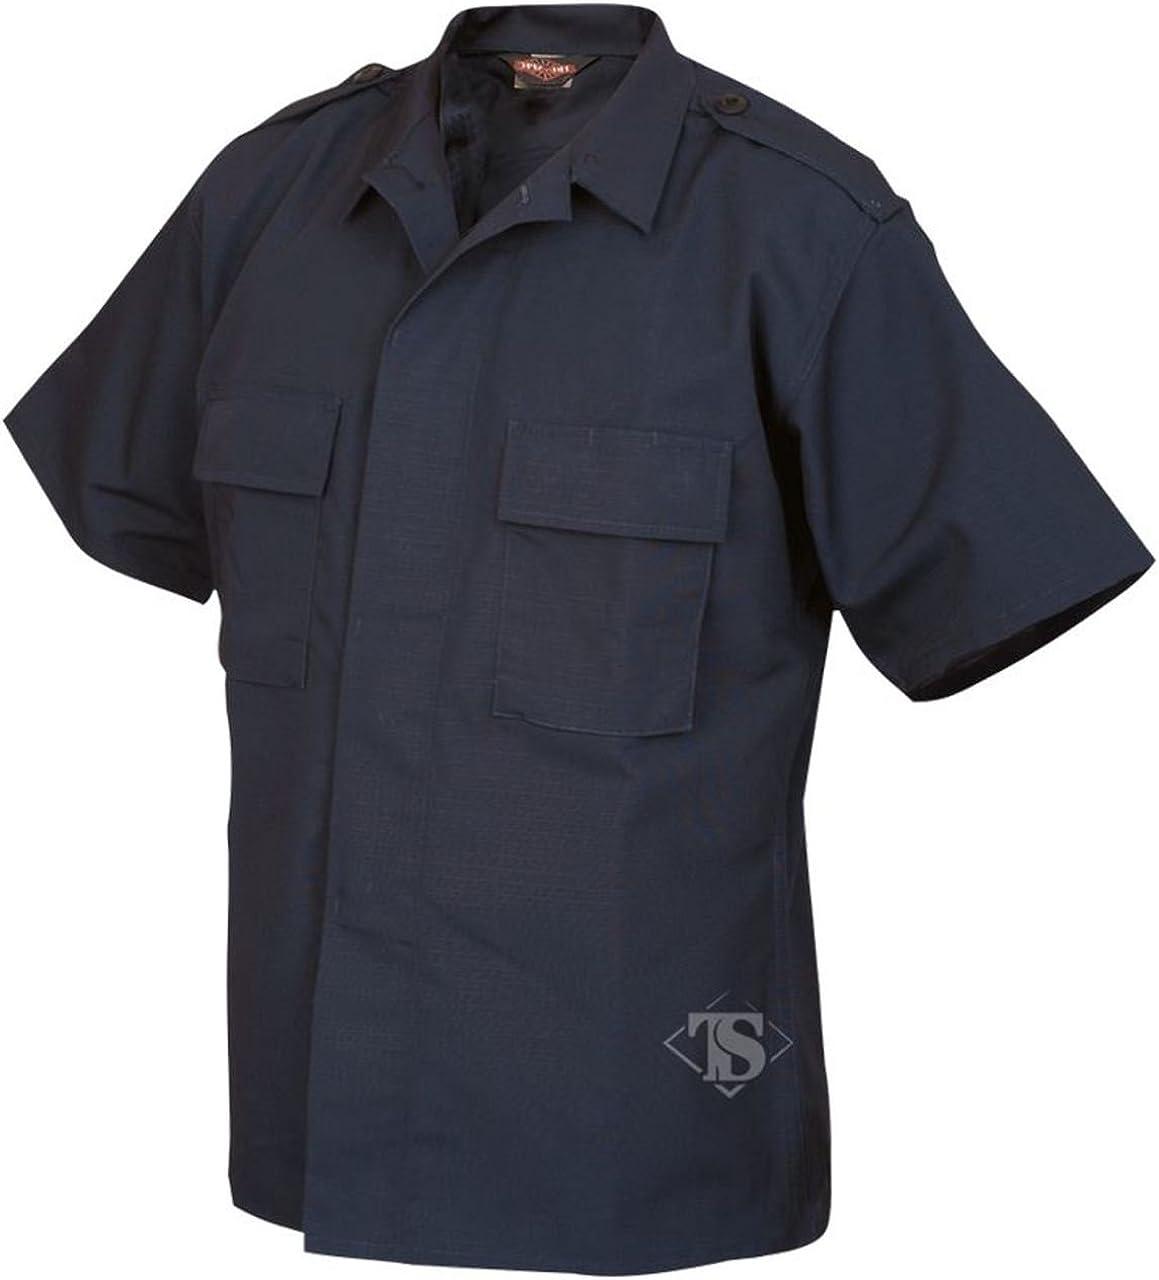 Tru-Spec 1001 Mens Short Sleeve Tactical Shirt, Rip-Stop, Navy Blue